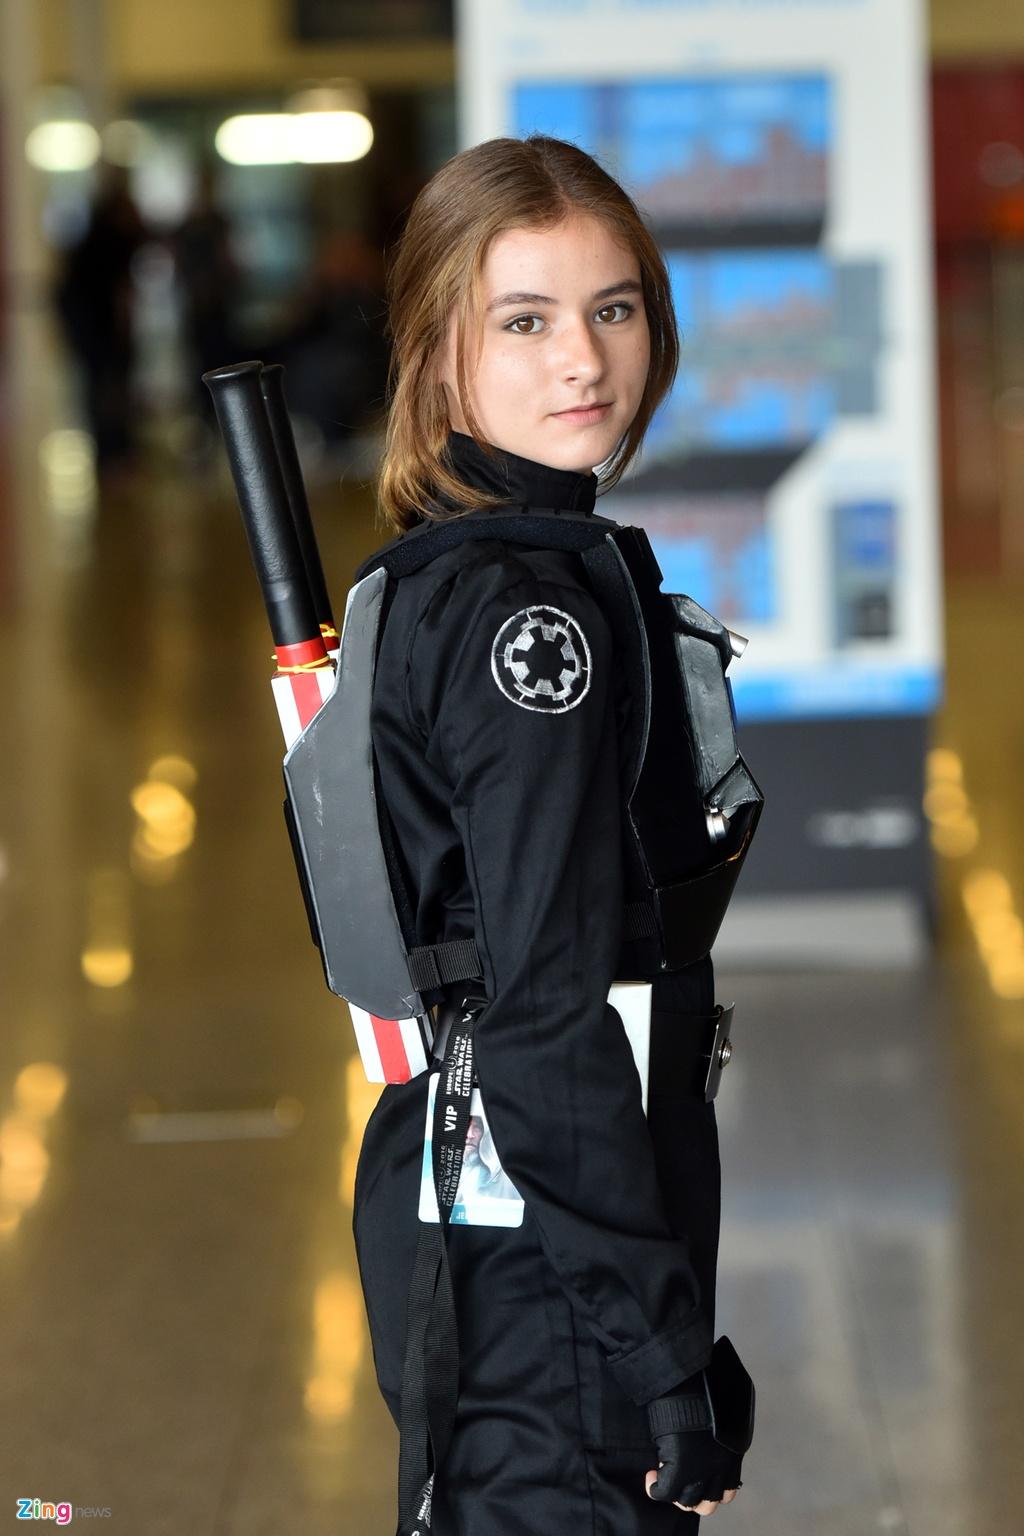 Van hoa cosplay cua nguoi phuong Tay qua 'Star Wars' hinh anh 15